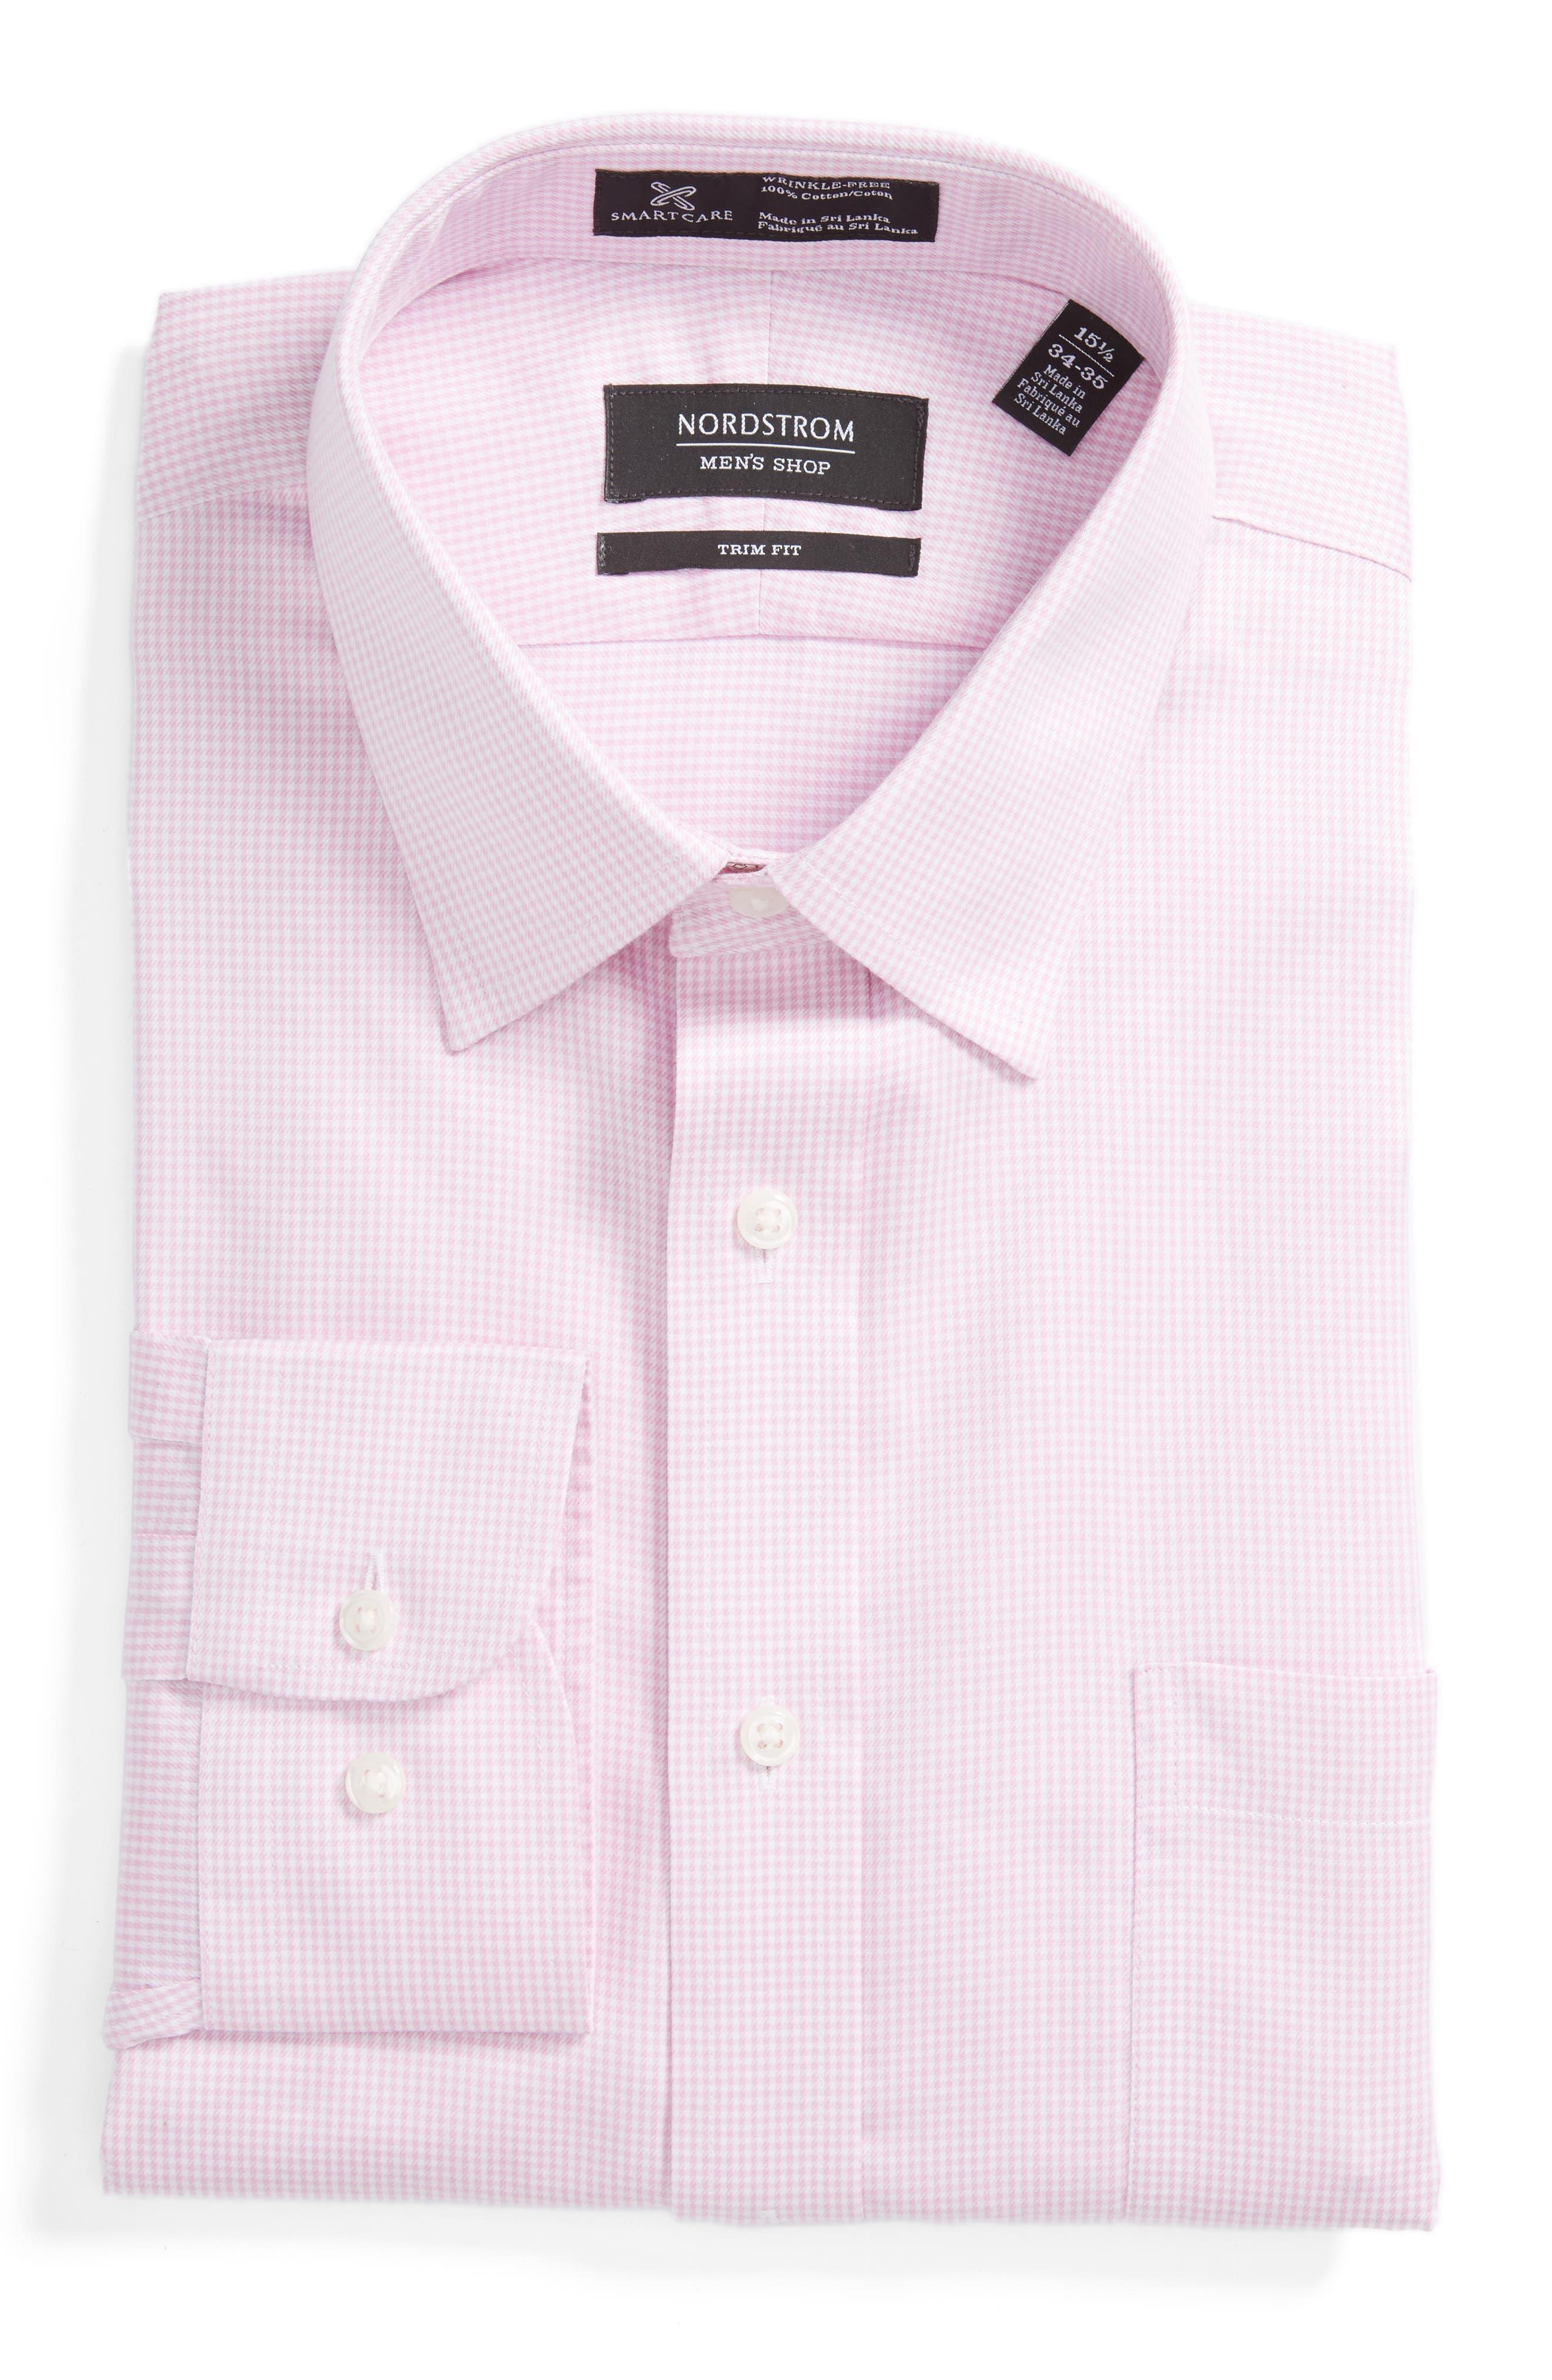 NORDSTROM MENS SHOP Smartcare<sup>™</sup> Trim Fit Stripe Dress Shirt